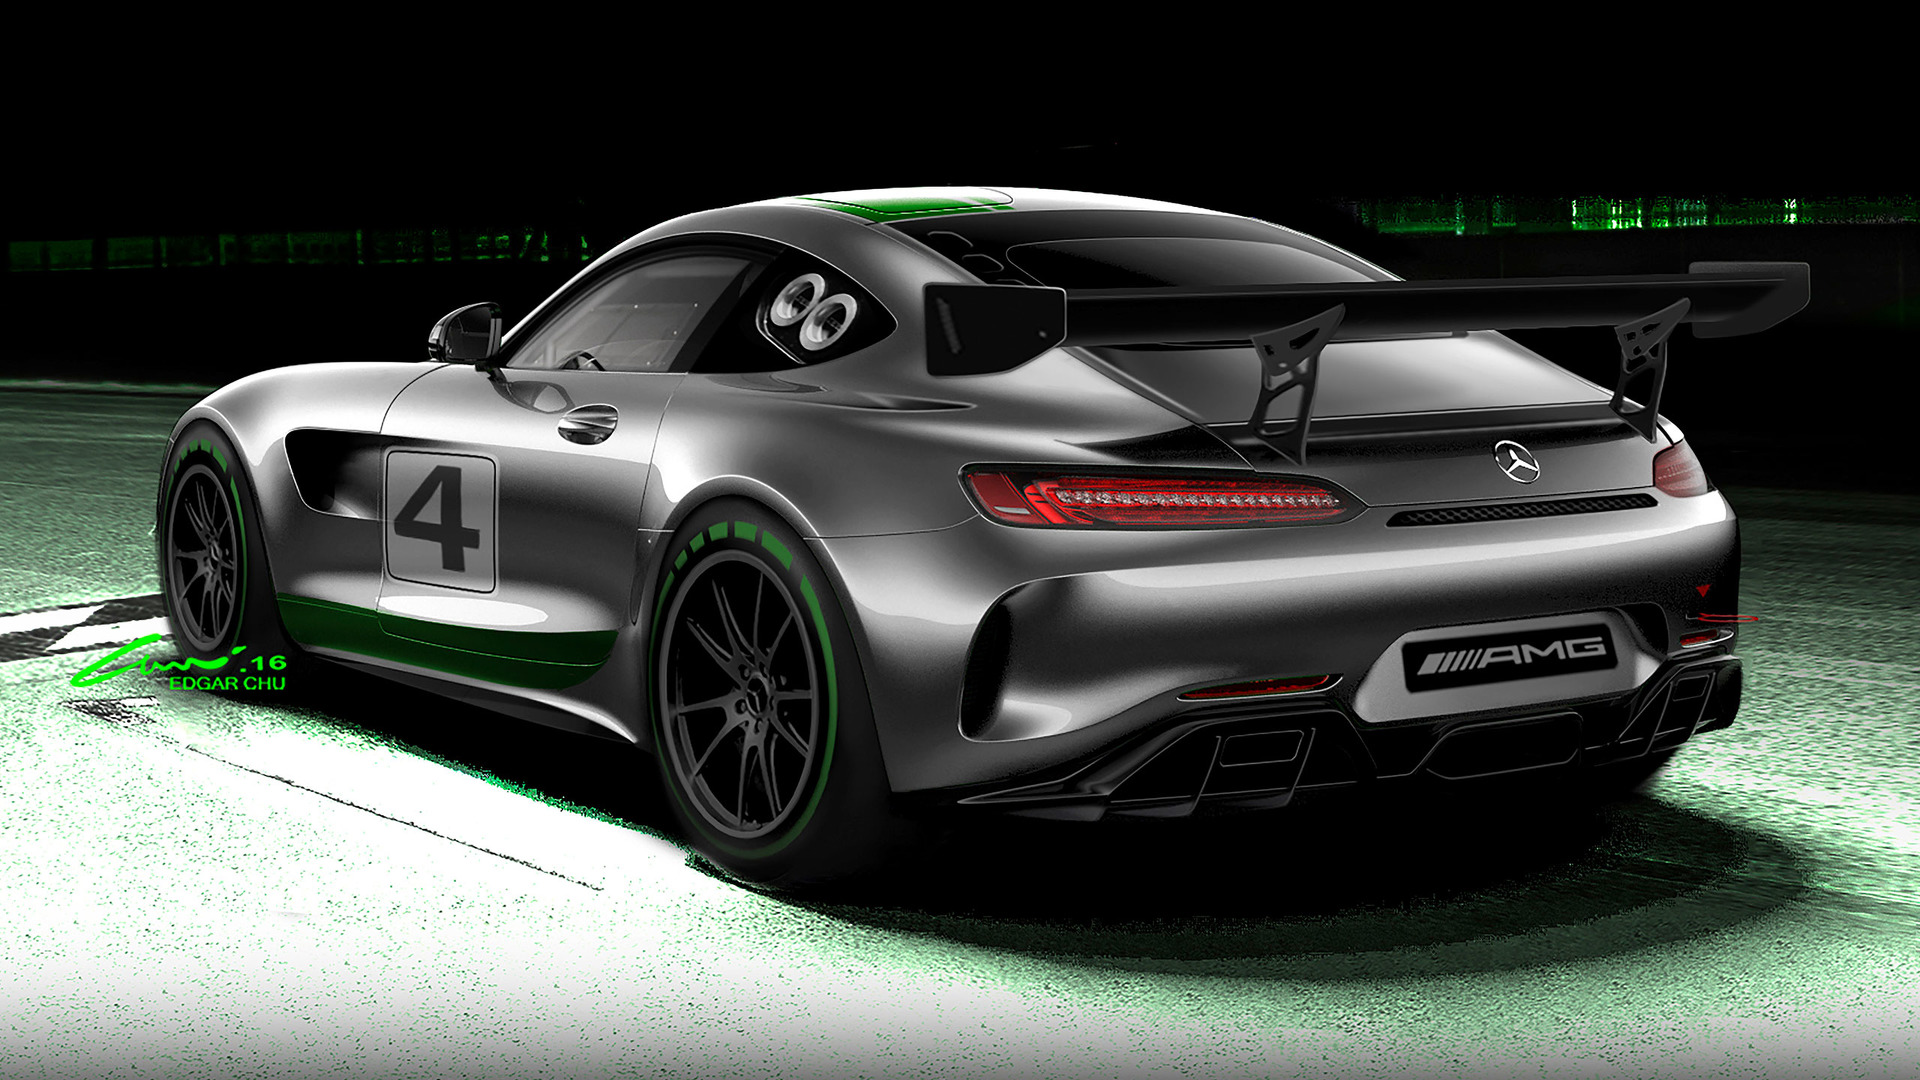 Mercedes-AMG\'s new GT4 race car looks stunning